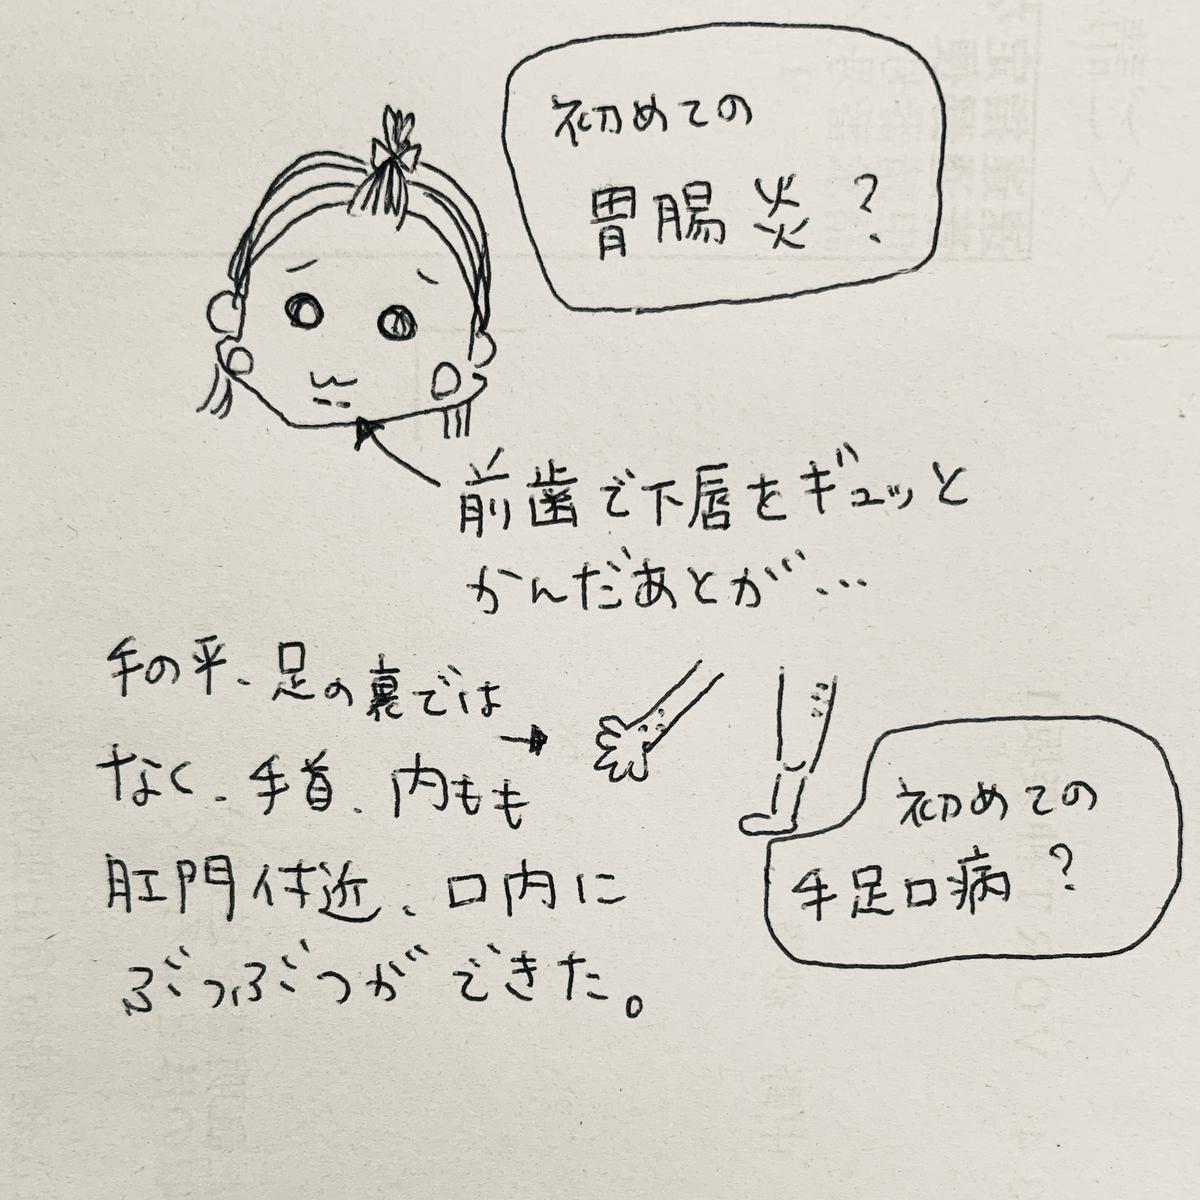 f:id:nananan0:20190617111151j:plain